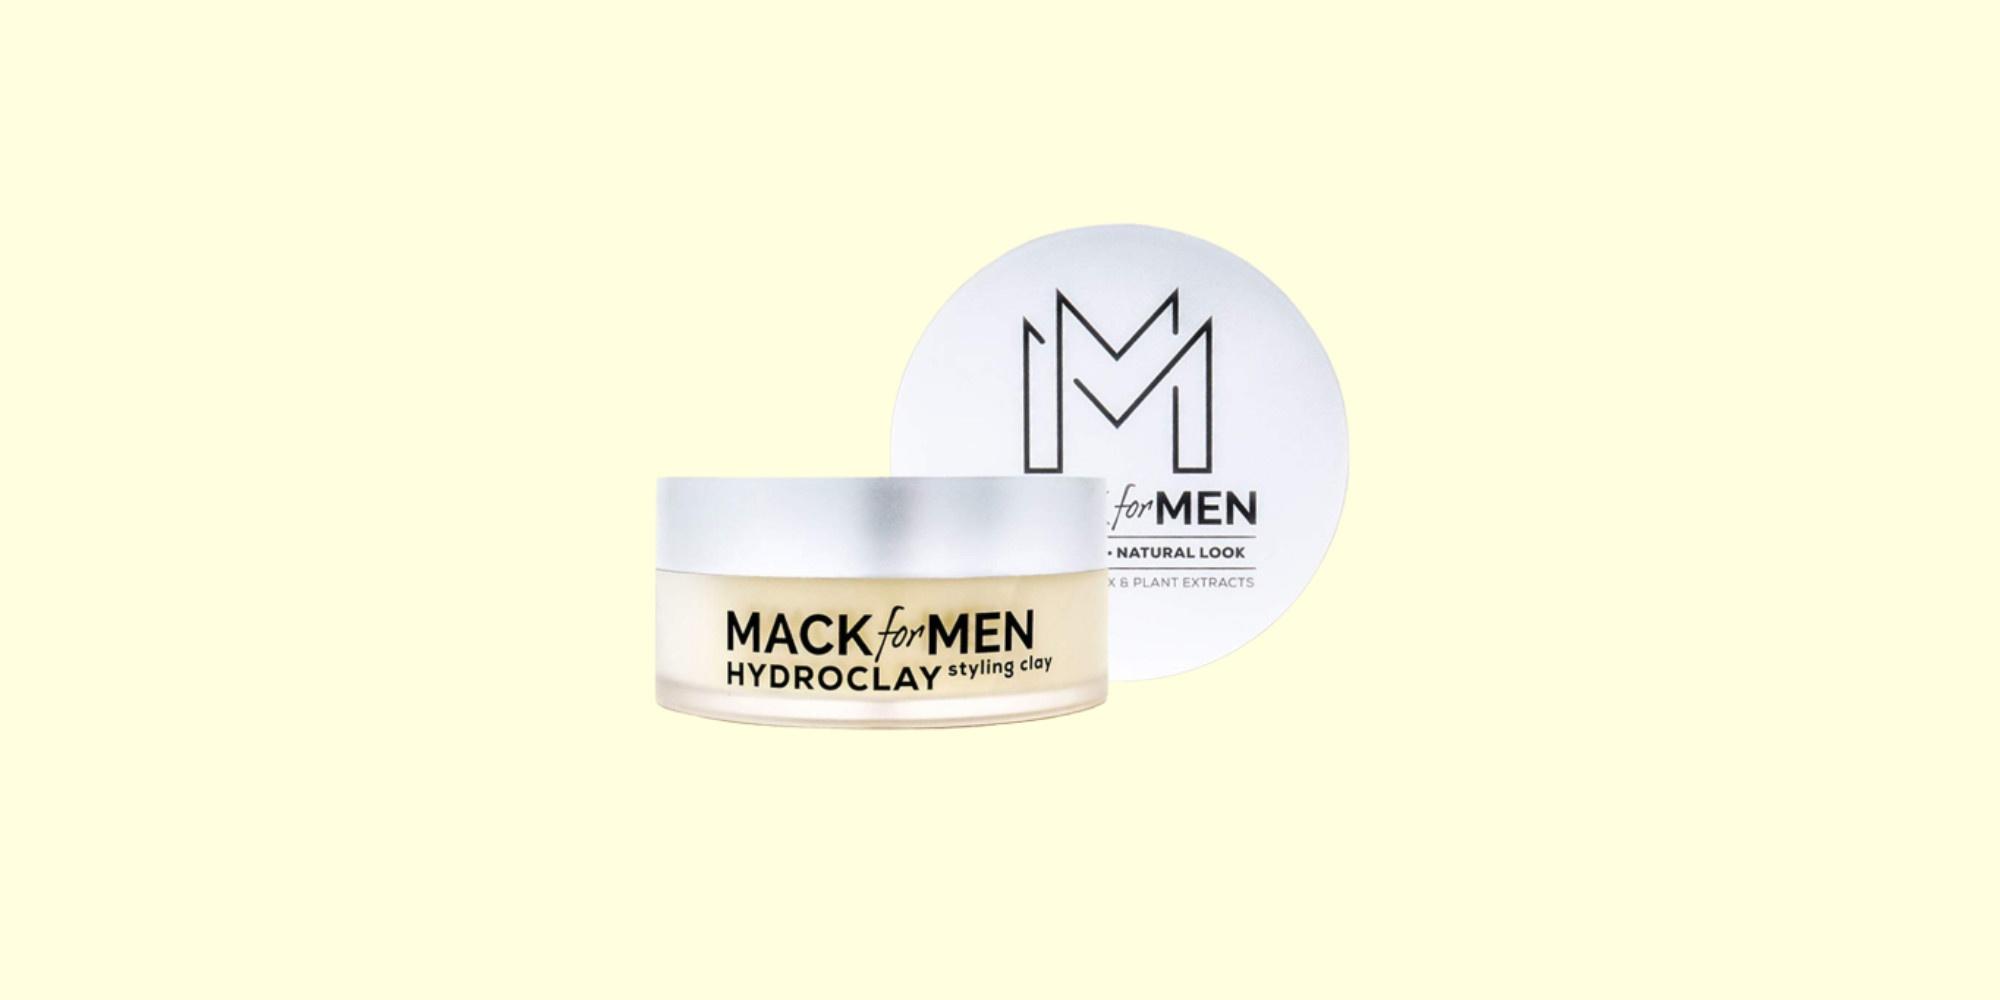 HydroClay Premium Hair Clay for Men